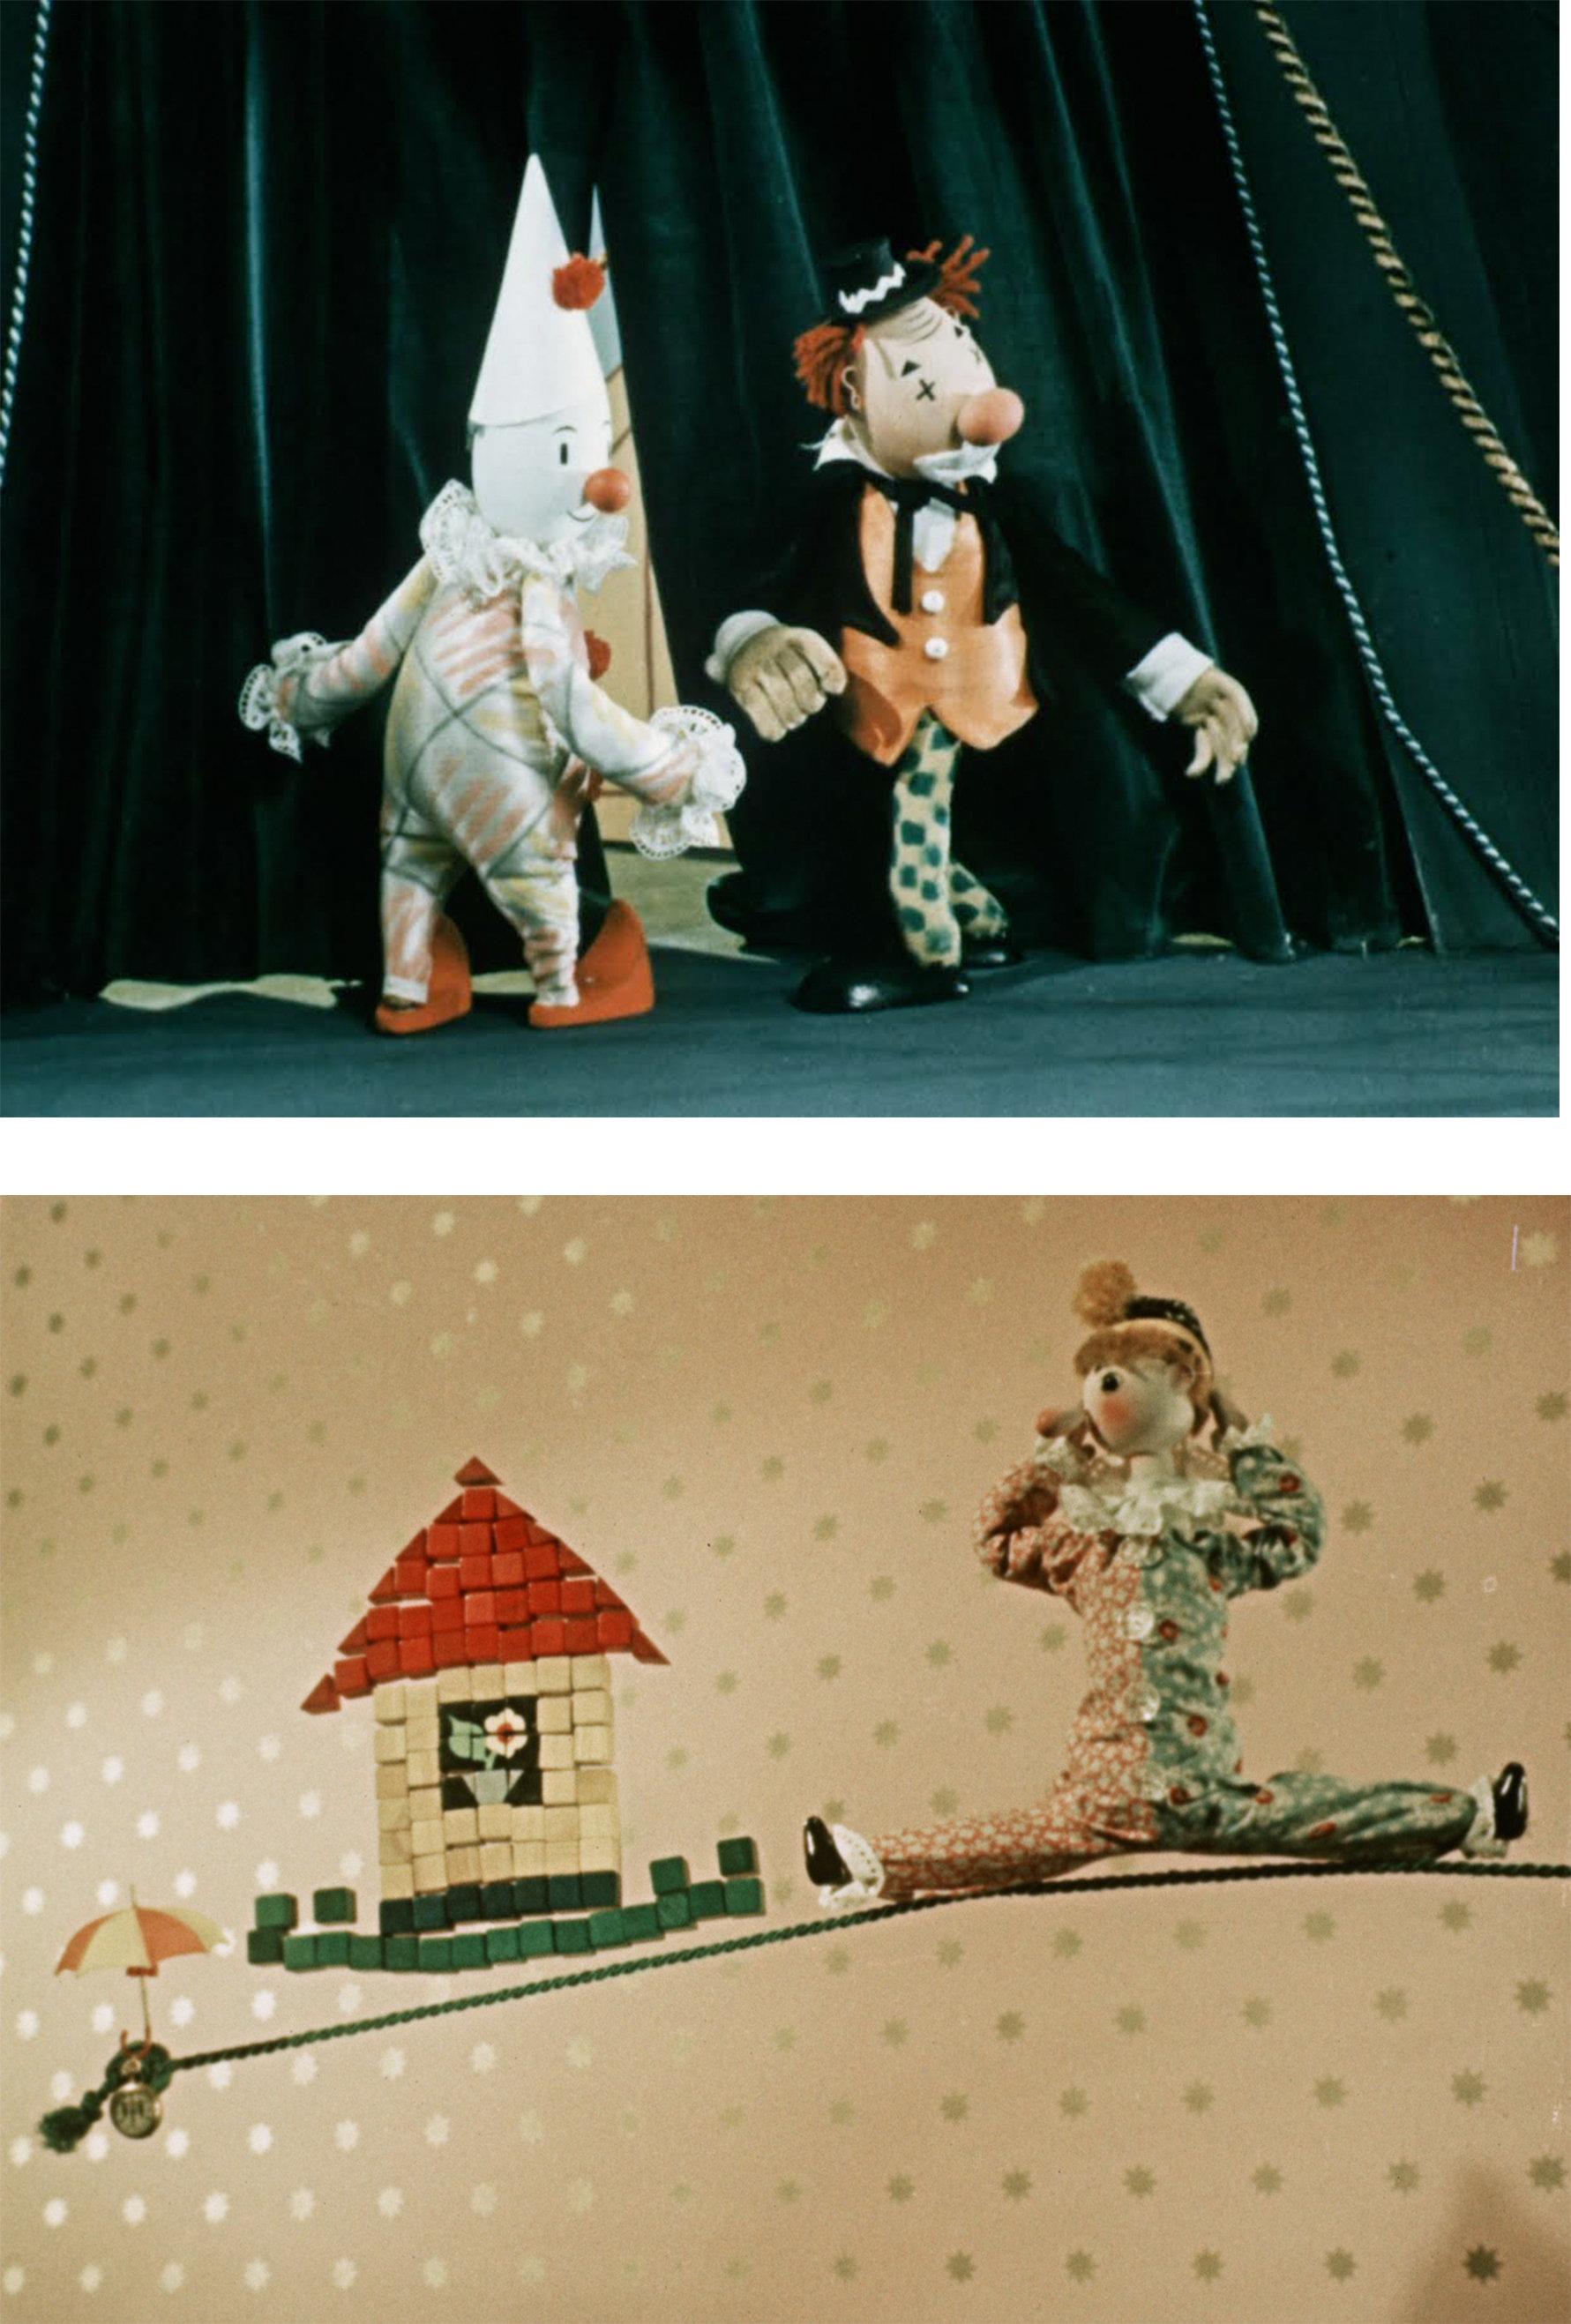 IMAGES: (top) Mister Prokouk, Acroba t, dir. Karel Zeman, 1959. (bottom) The Little Umbrella , dir. Břetislav Pojar, 1957.